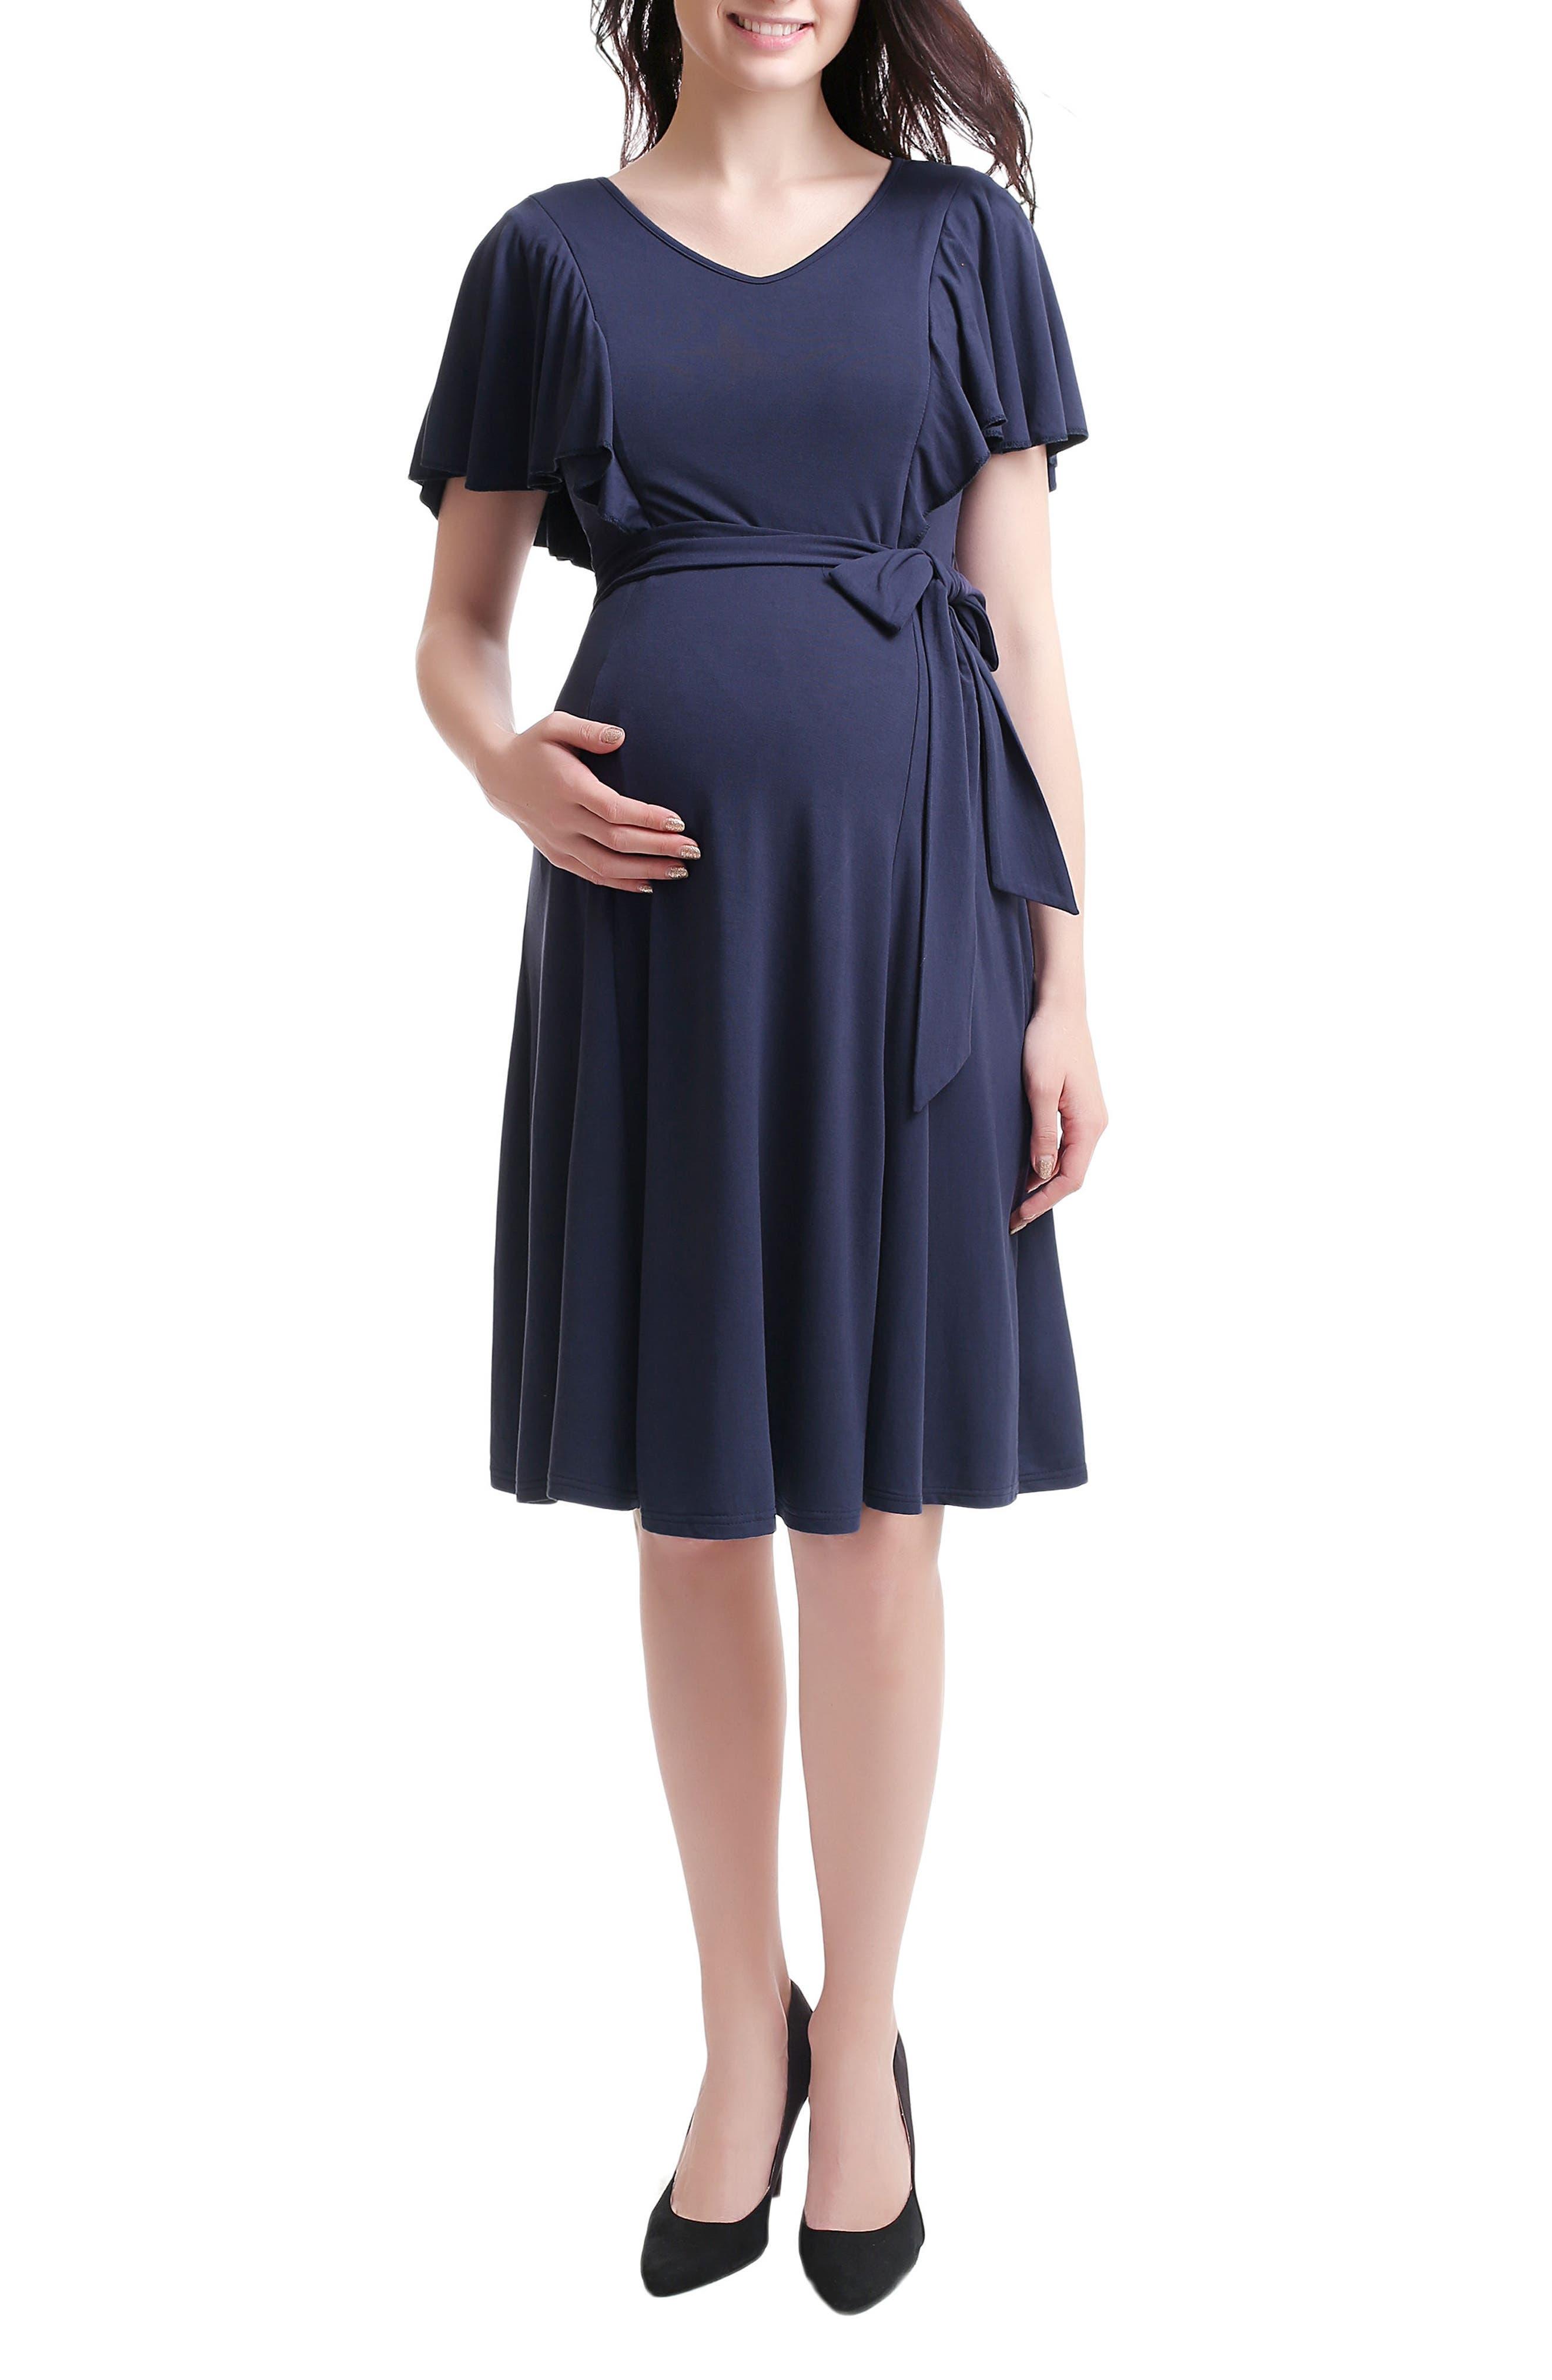 Kimi & Kai Rhea Tie Maternity/Nursing Skater Dress,                             Main thumbnail 1, color,                             NAVY